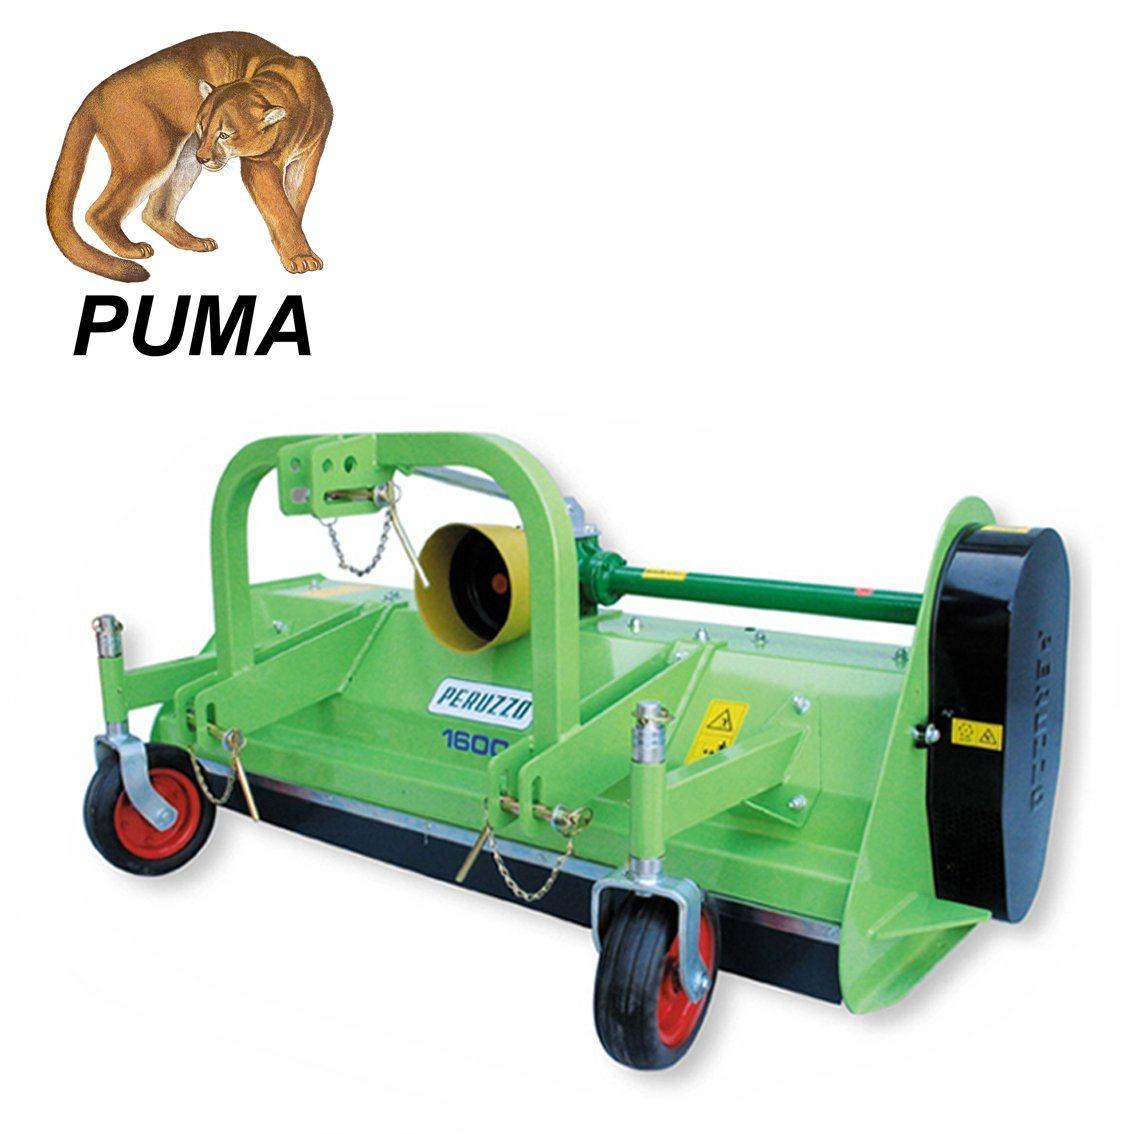 , Flail Mower PUMA, Peruzzo